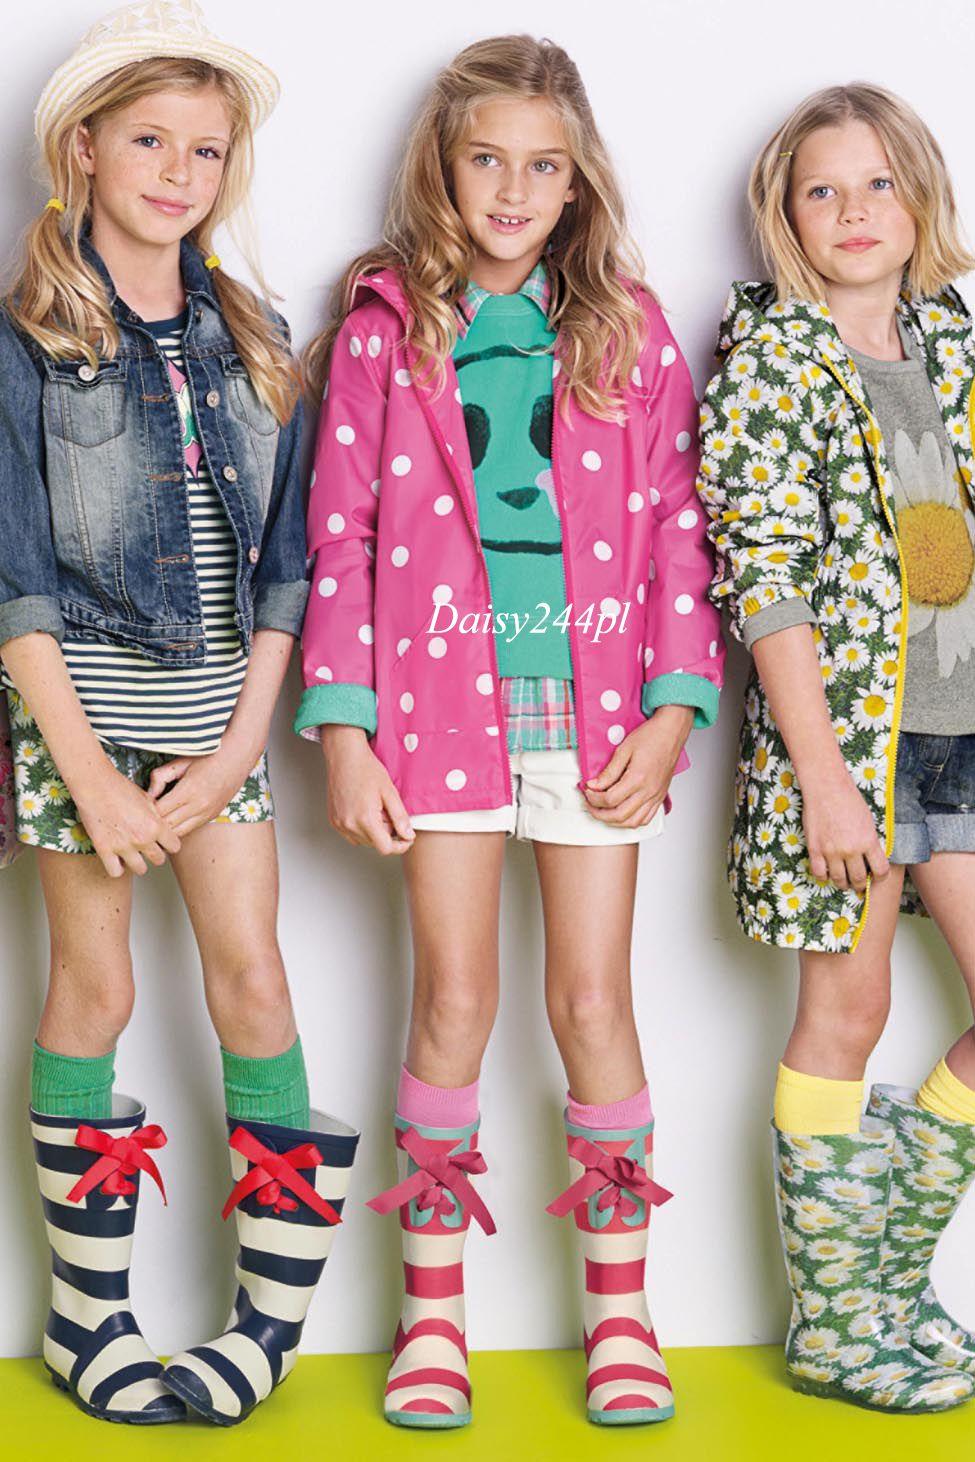 Next Bluza Jumper Jade Panda Mietowa Super 116 3823621116 Oficjalne Archiwum Allegro Panda Sweater Little Princess Wellington Boot